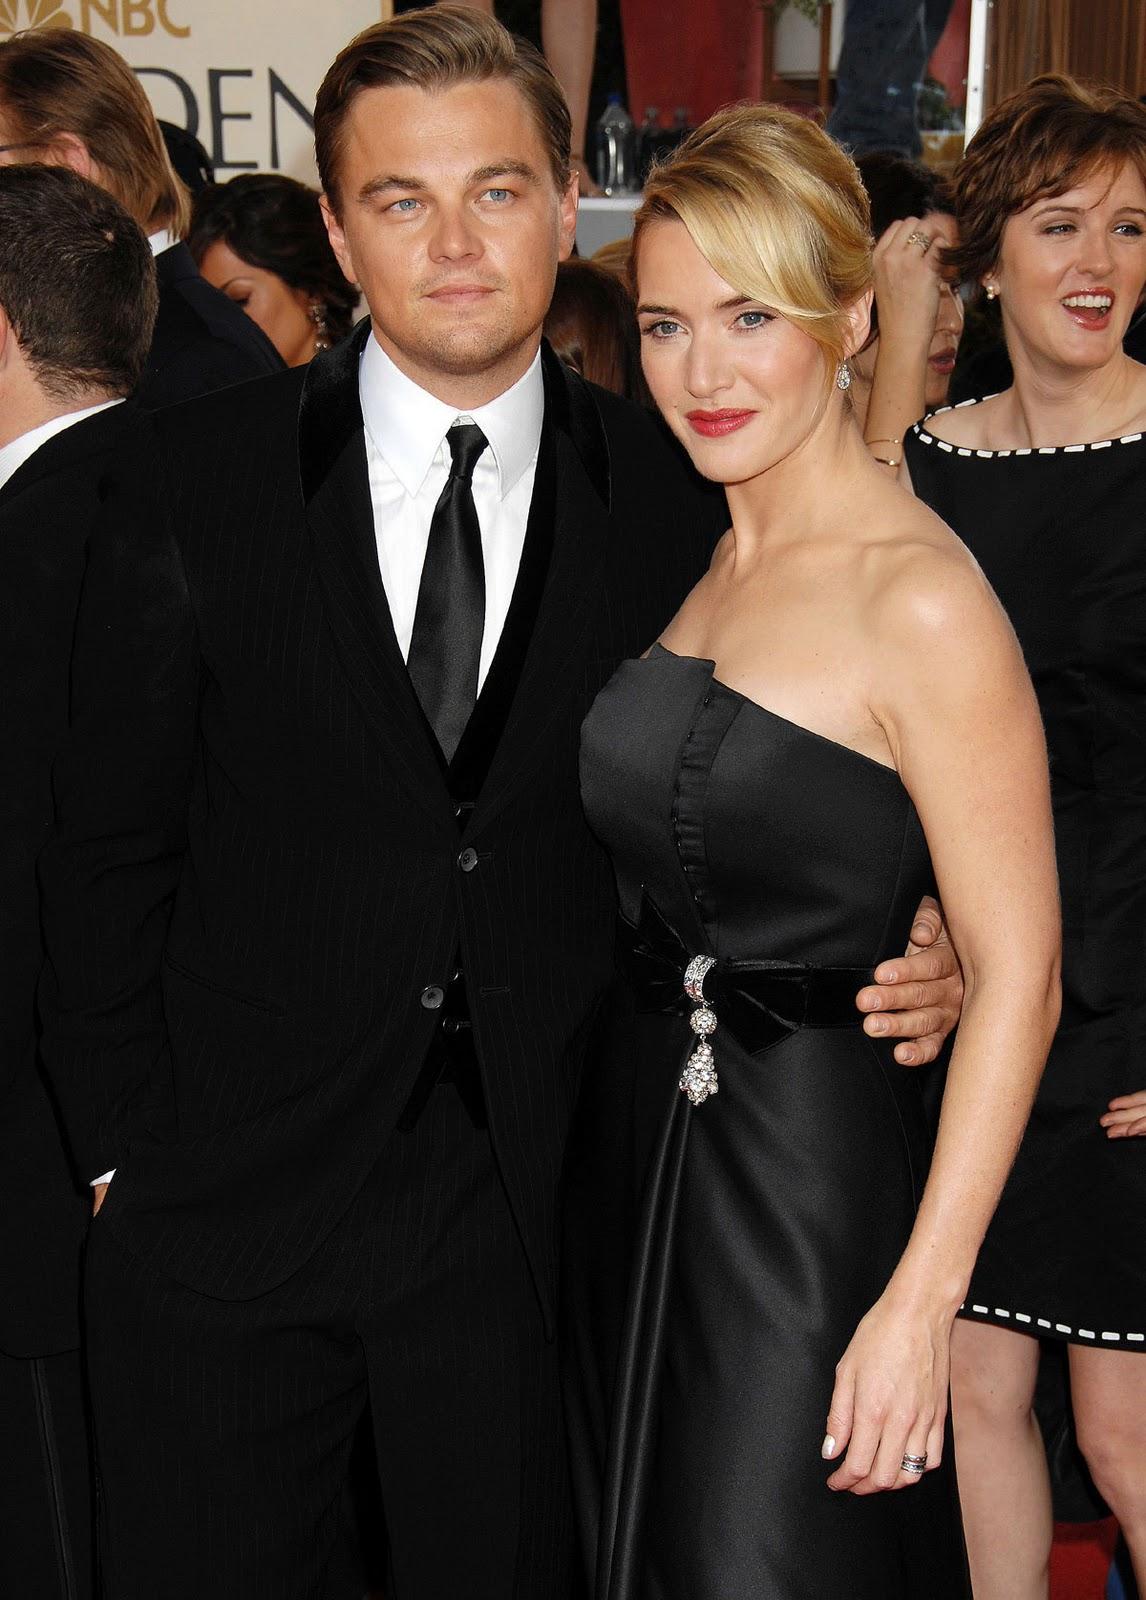 http://4.bp.blogspot.com/-4lXt38o18XA/TtUGSJ6NpOI/AAAAAAAAAFw/ka3TAqcOYME/s1600/Kate-Winslet-Leonardo-DiCaprio-at-the-Golden-Globes-kate-winslet-and-leonardo-dicaprio-4884007-1200-1675.jpg